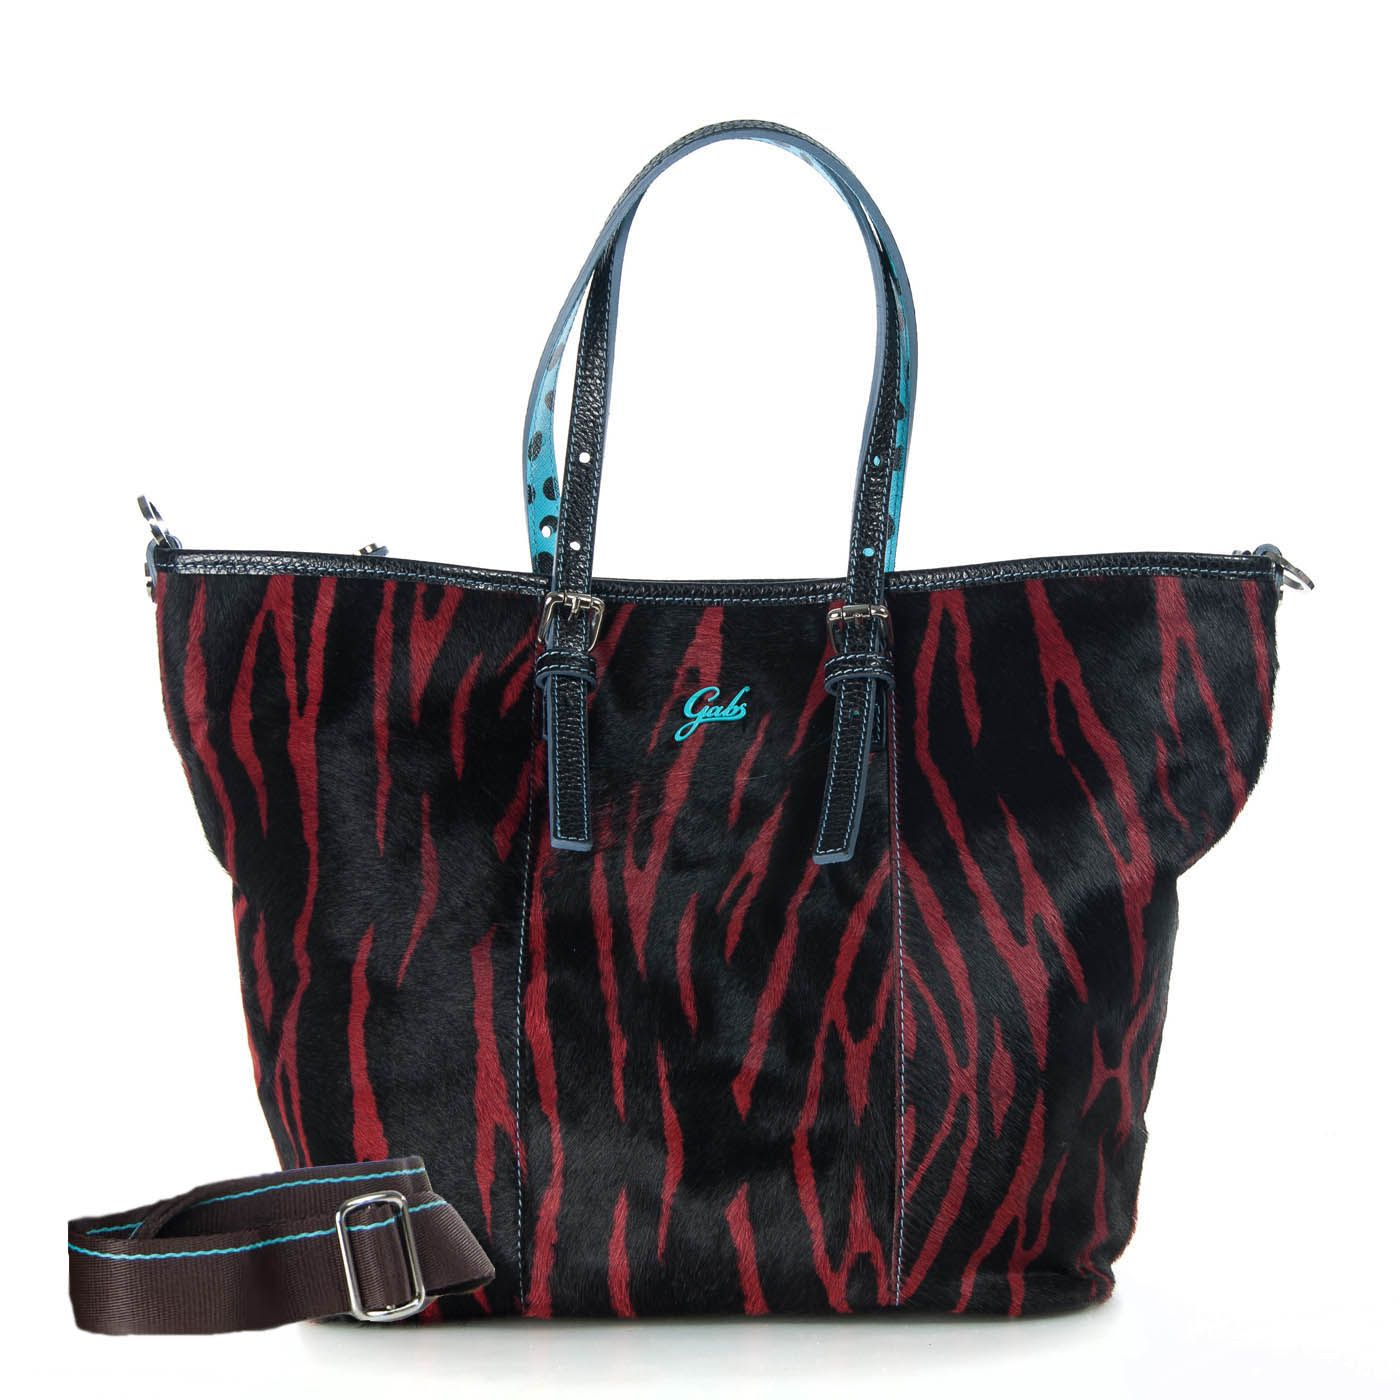 534729bec5 Gabs animal print ponyskin transformer handbag- one side with animal print  ponyskin and the other side plain black genuine leather